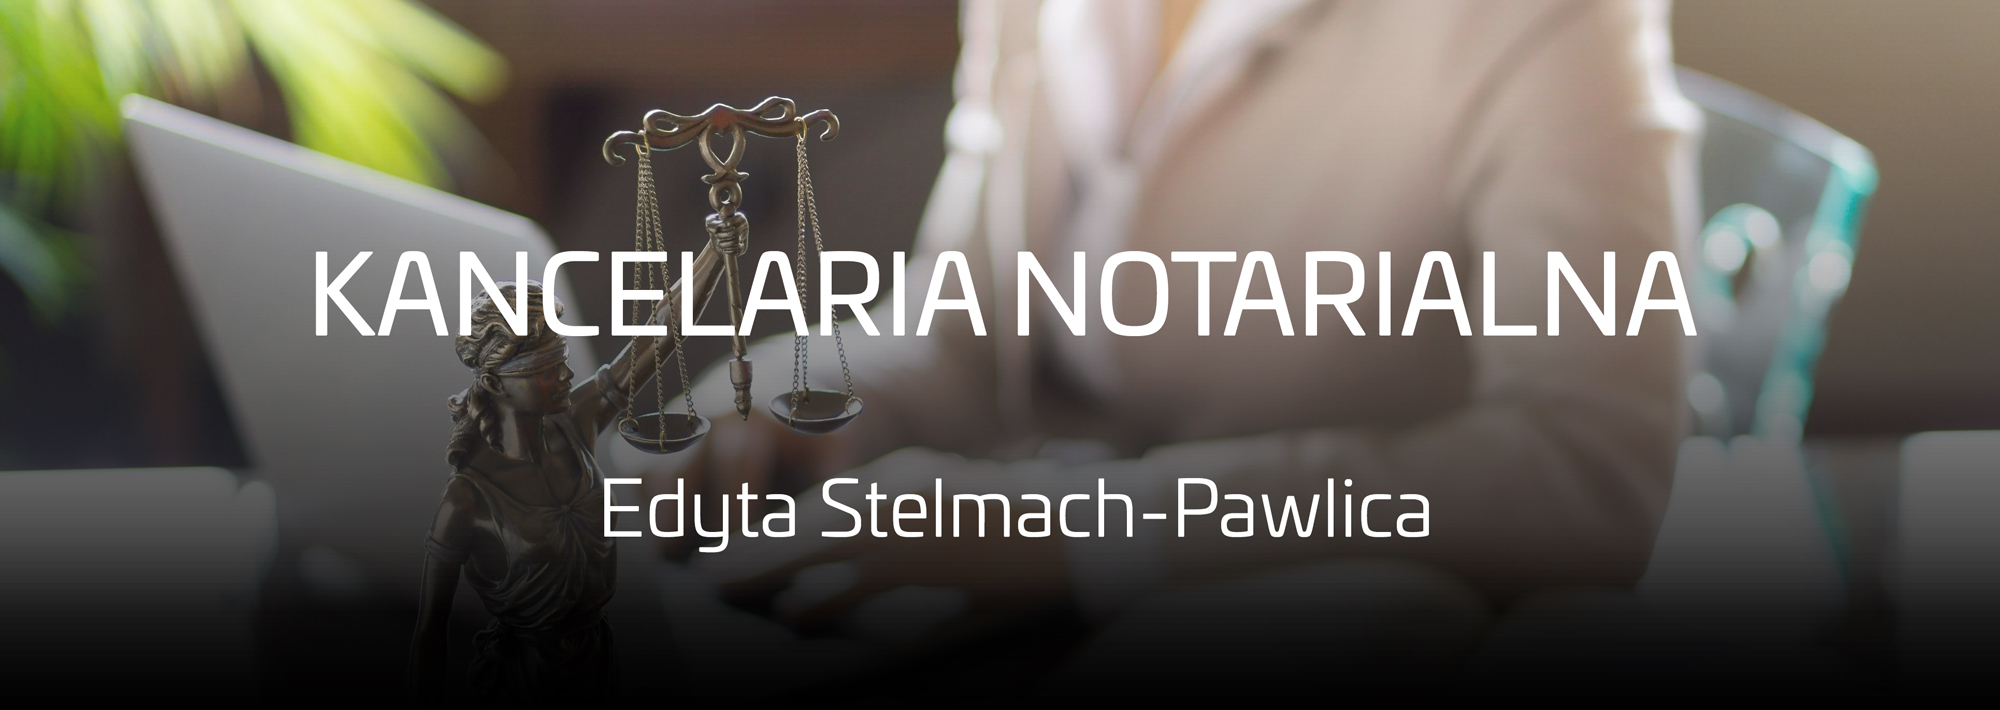 notariusz-gliwice